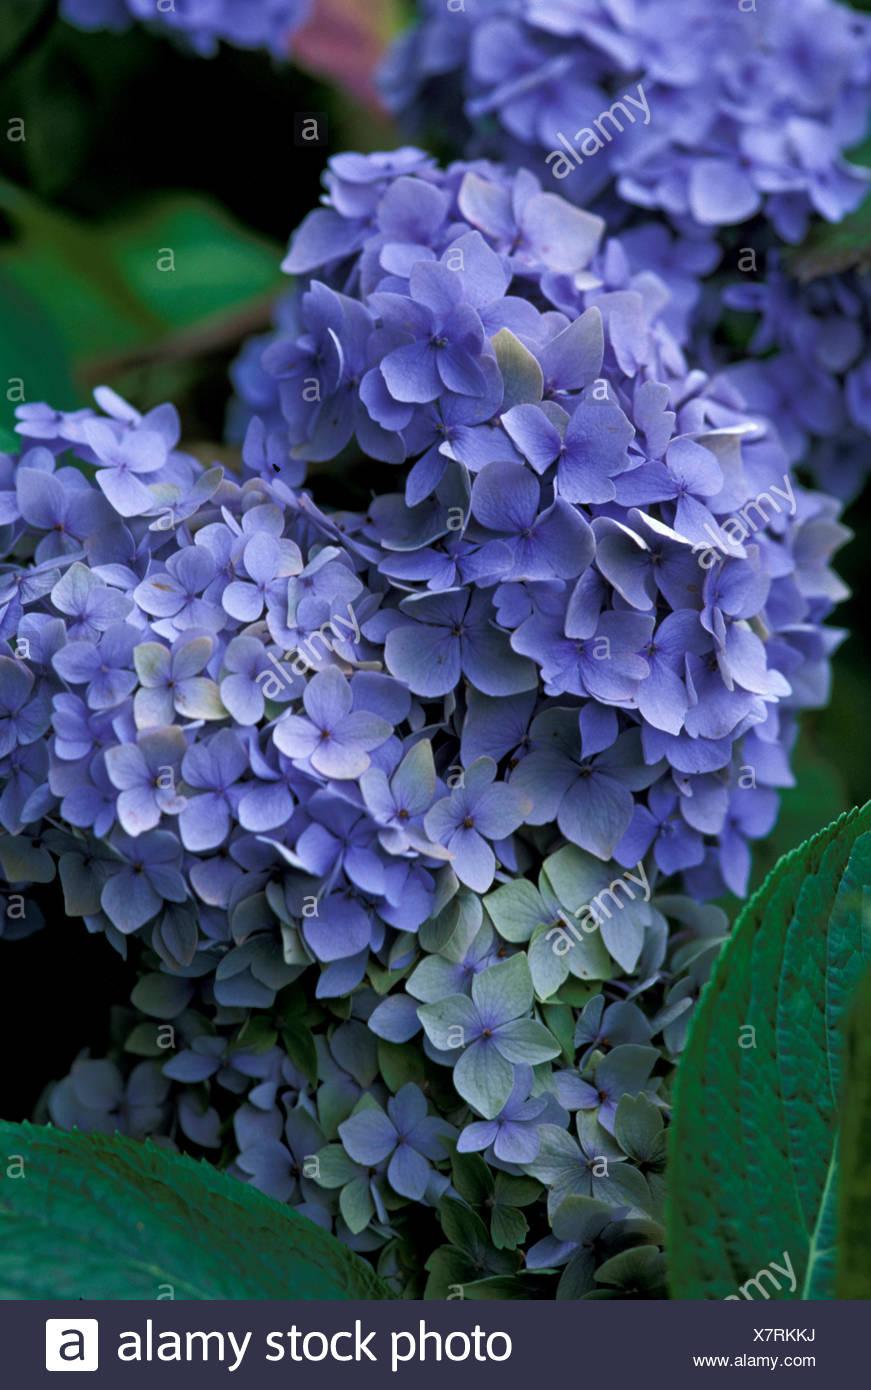 Hydrangea Macrophylla Blue Bonnet Flowers Stock Photo 280188822 Alamy